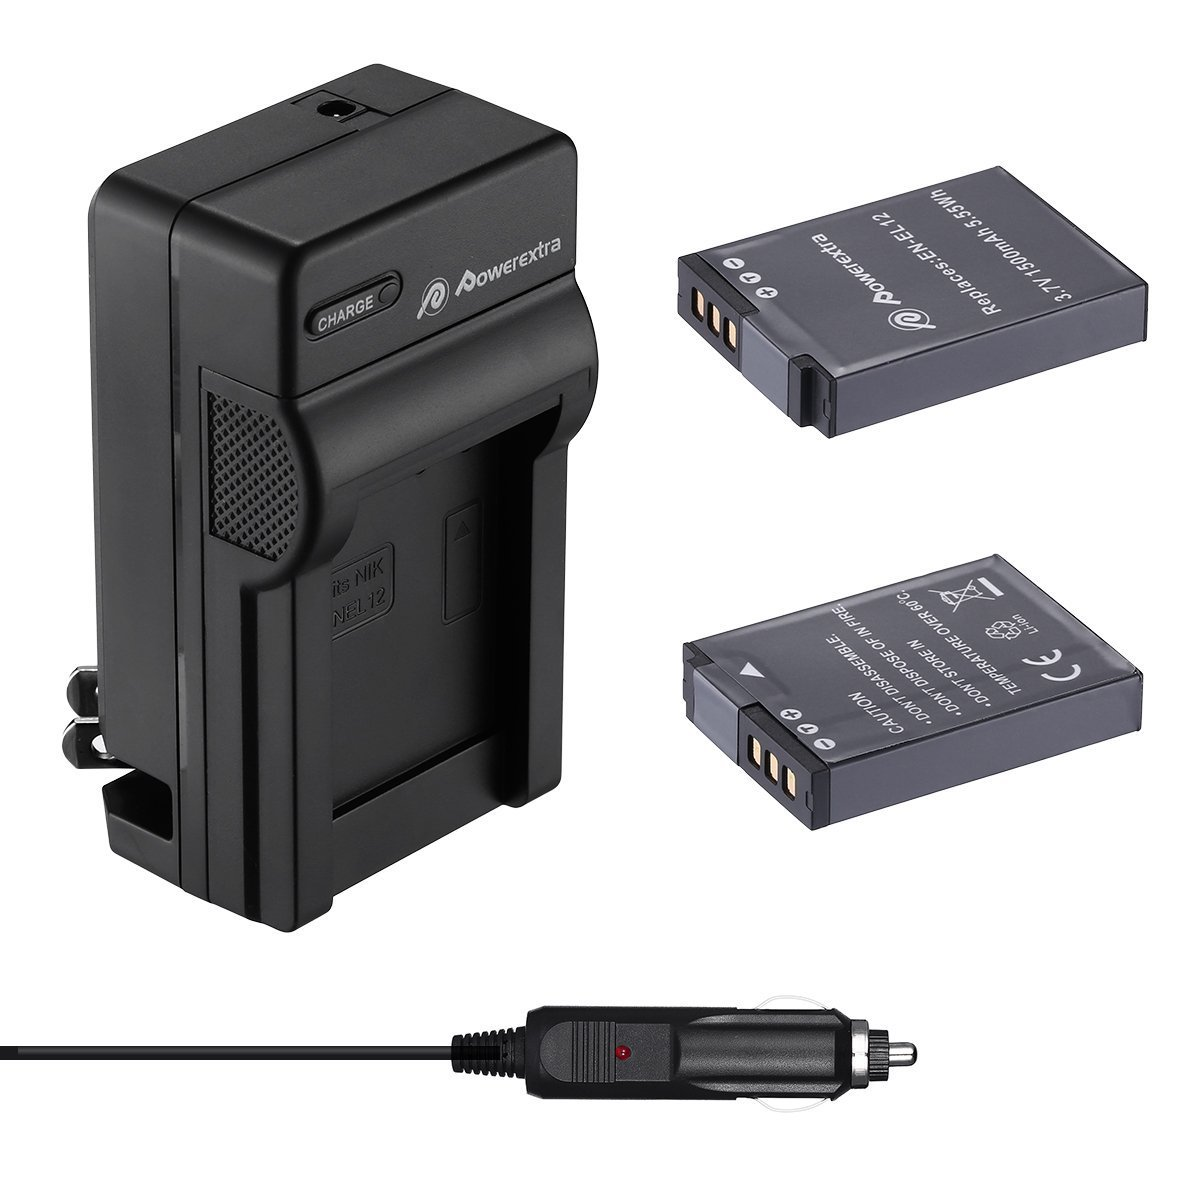 Powerextra 2 Pack Battery and Charger for Nikon EN-EL12 and Nikon Key Mission 360, Nikon Coolpix AW130, A900, W300, P340, S9900, S8200, S6300, S1200pj, S800C, S710, S31, S70, etc(check description)